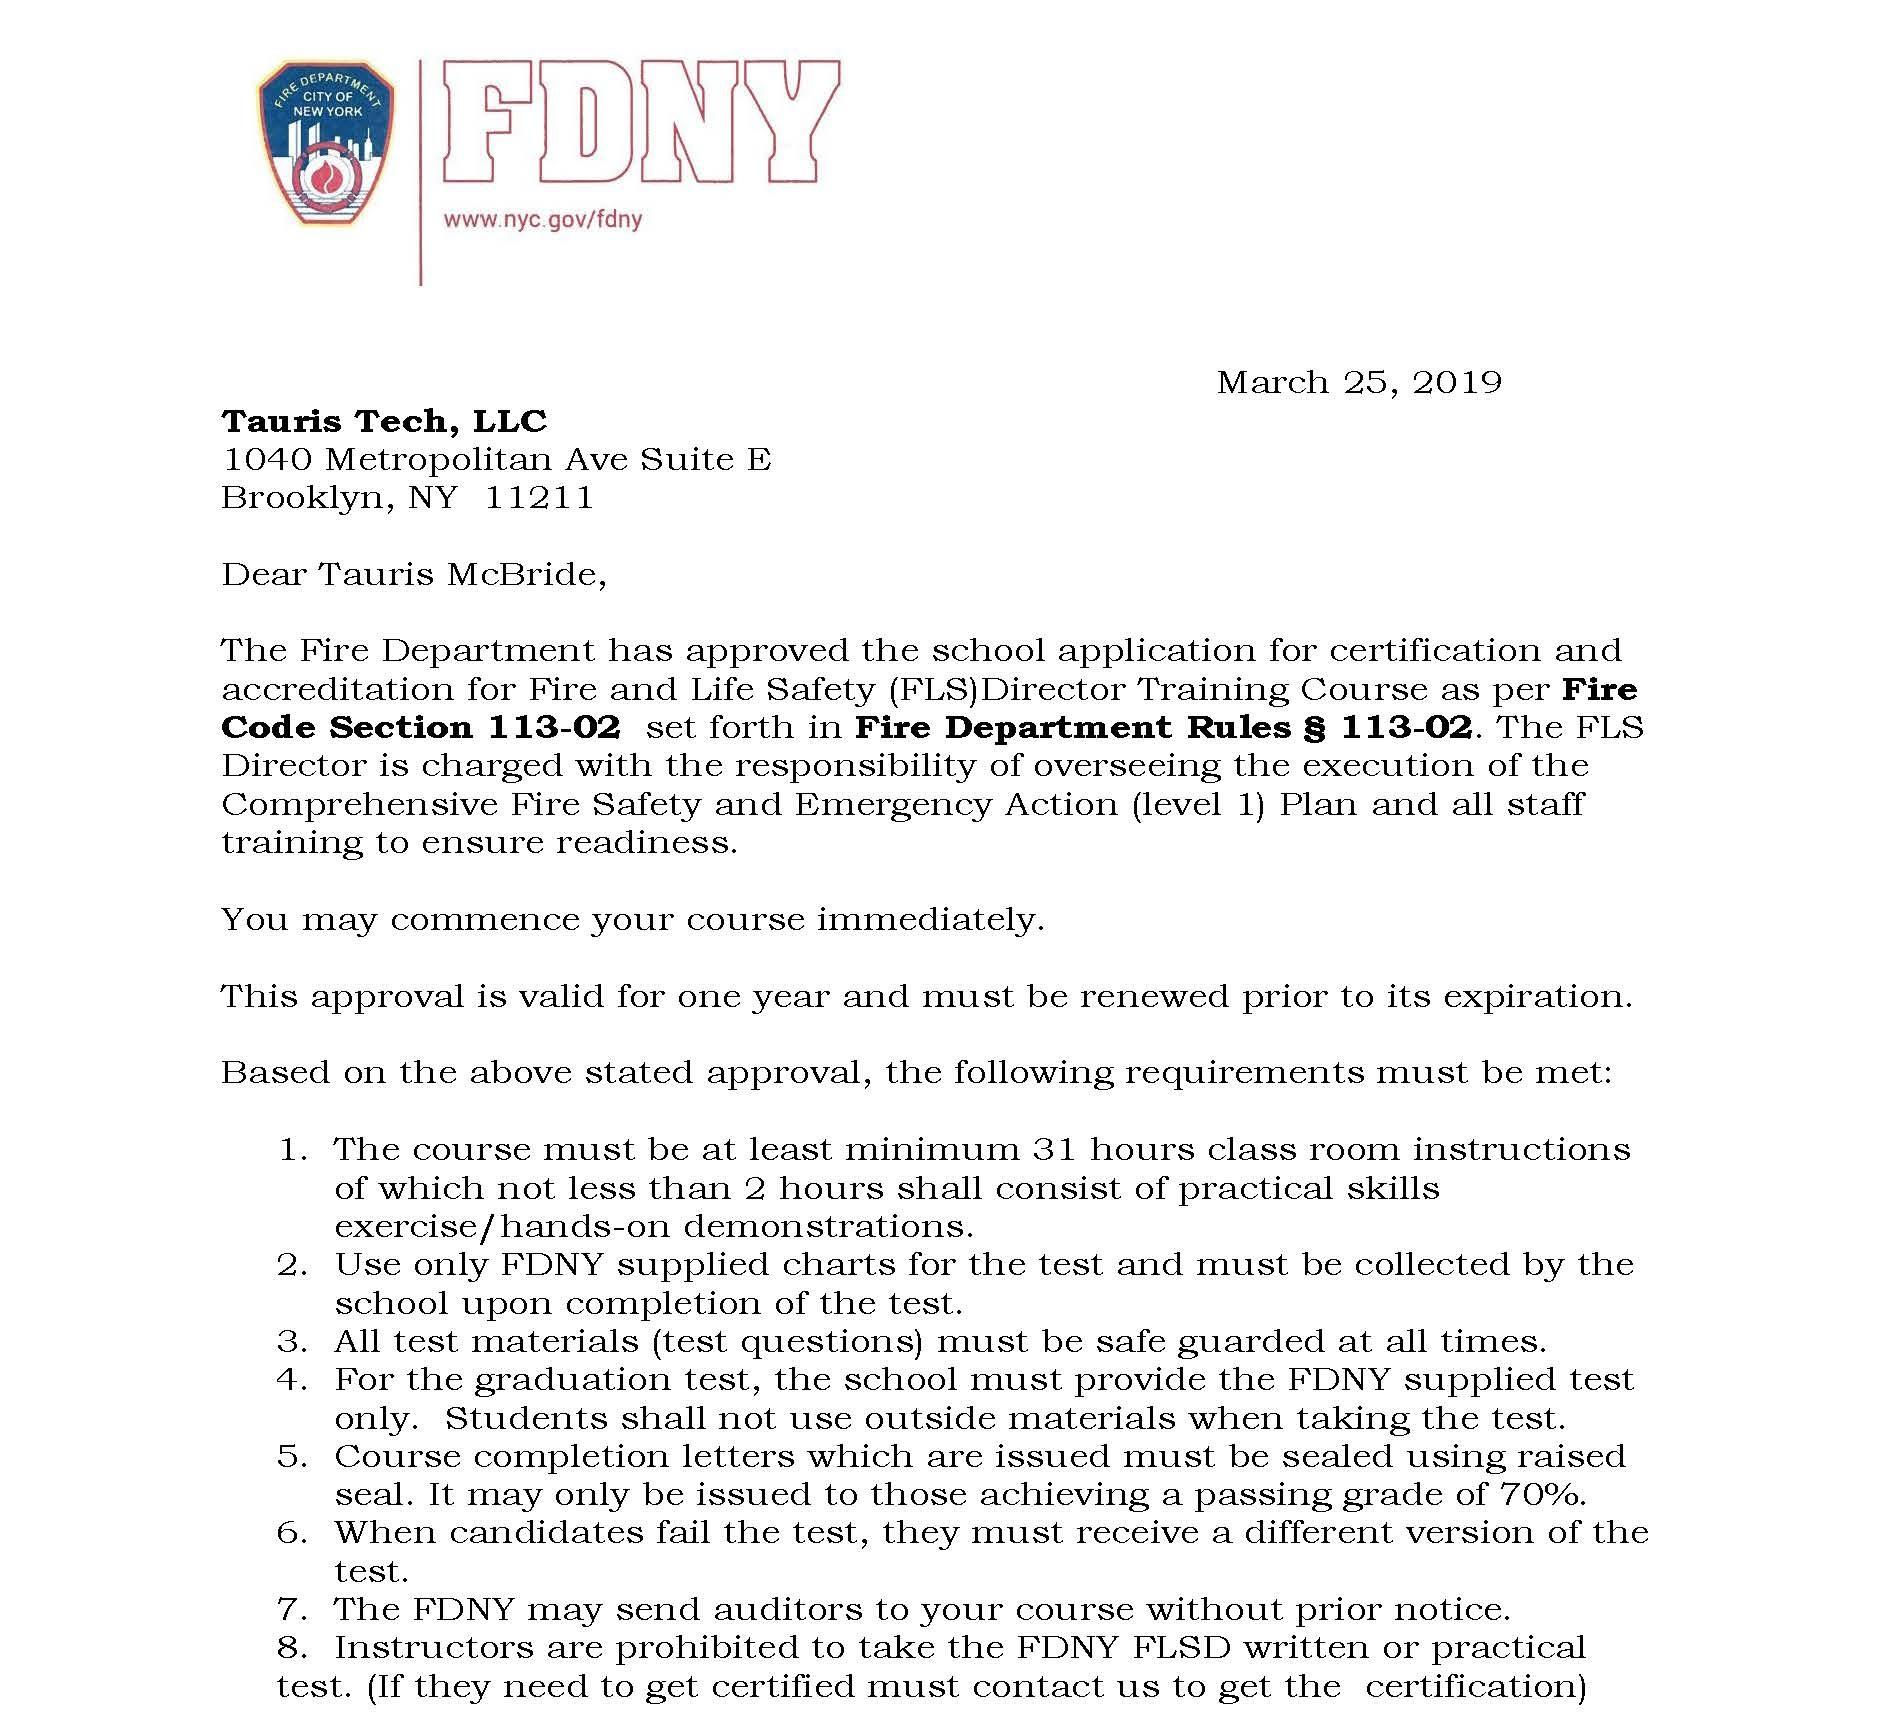 Tauris Tech LLC Letter of Acceptance for FLSD course 3-25-19_Page_1.jpg